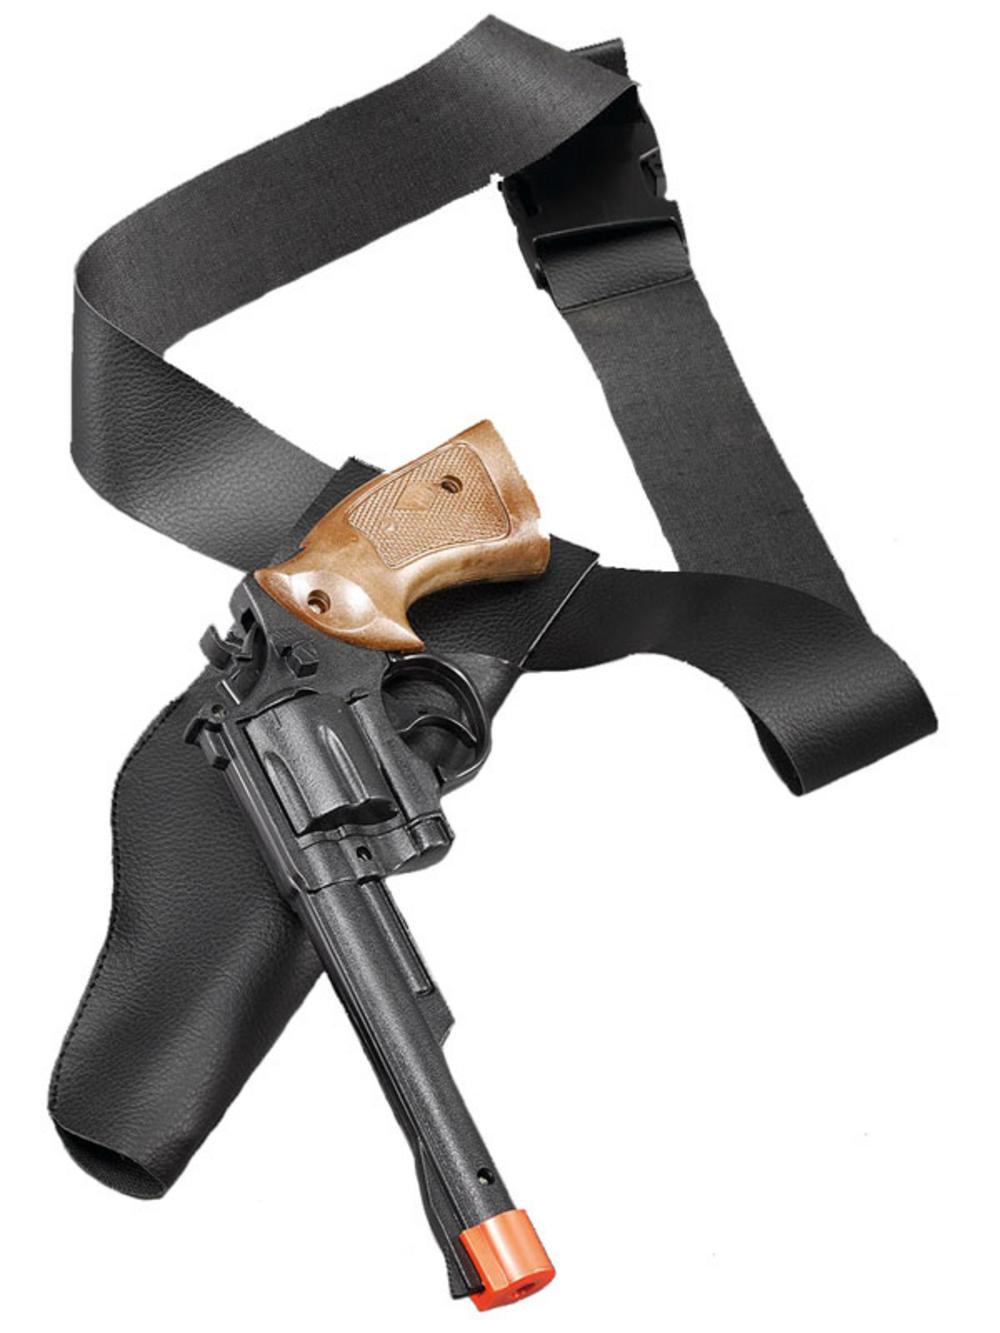 Cap Gun Toys  We Buy and Sell Cap Guns